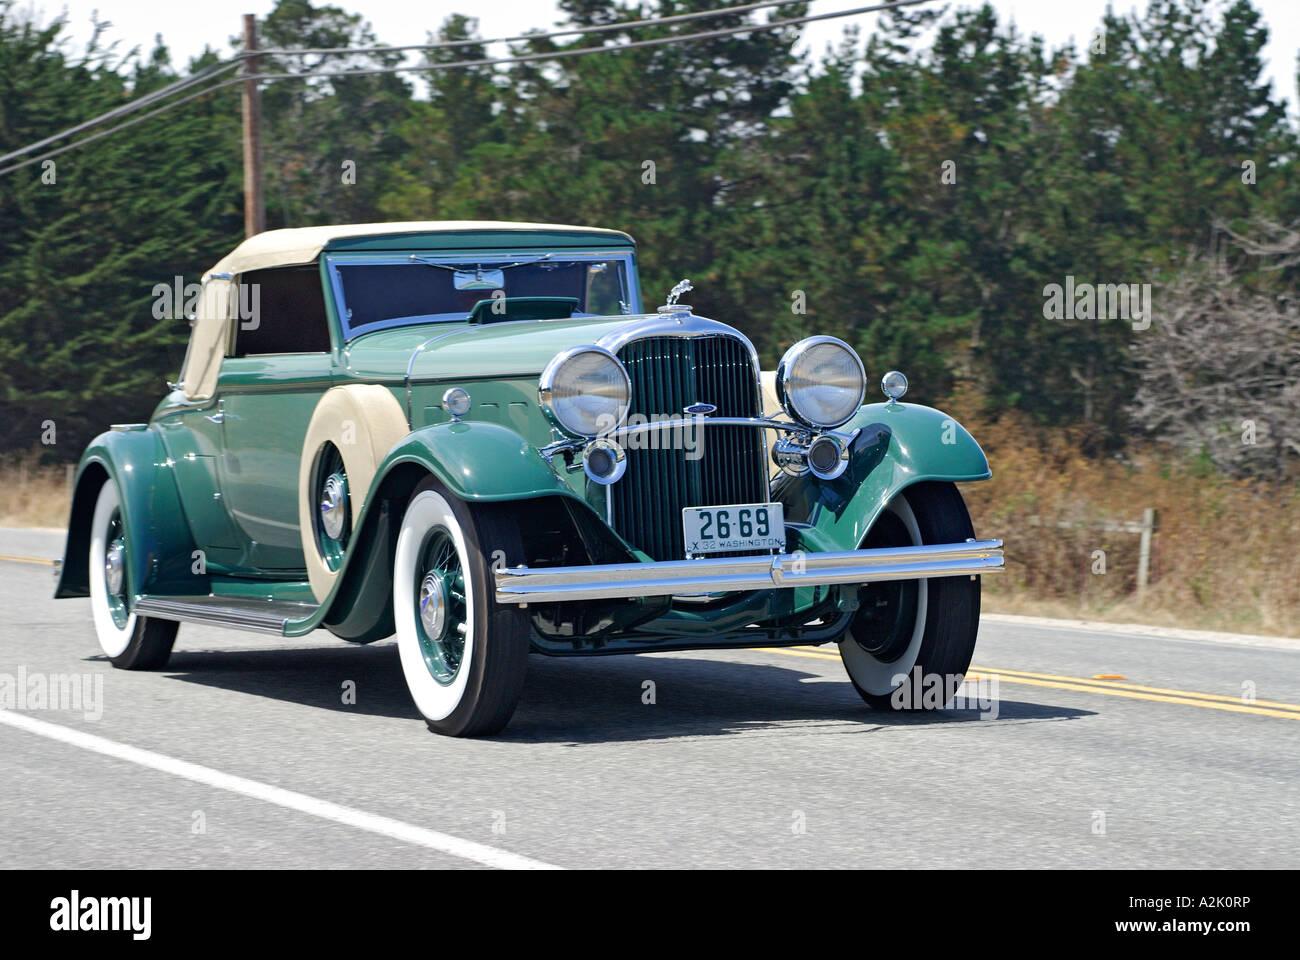 'Lincoln KB LeBaron ^Convertible ^Roadster, ^1932, 'Pebble Beach Concourse d'Elegance Tour', Monterey, - Stock Image